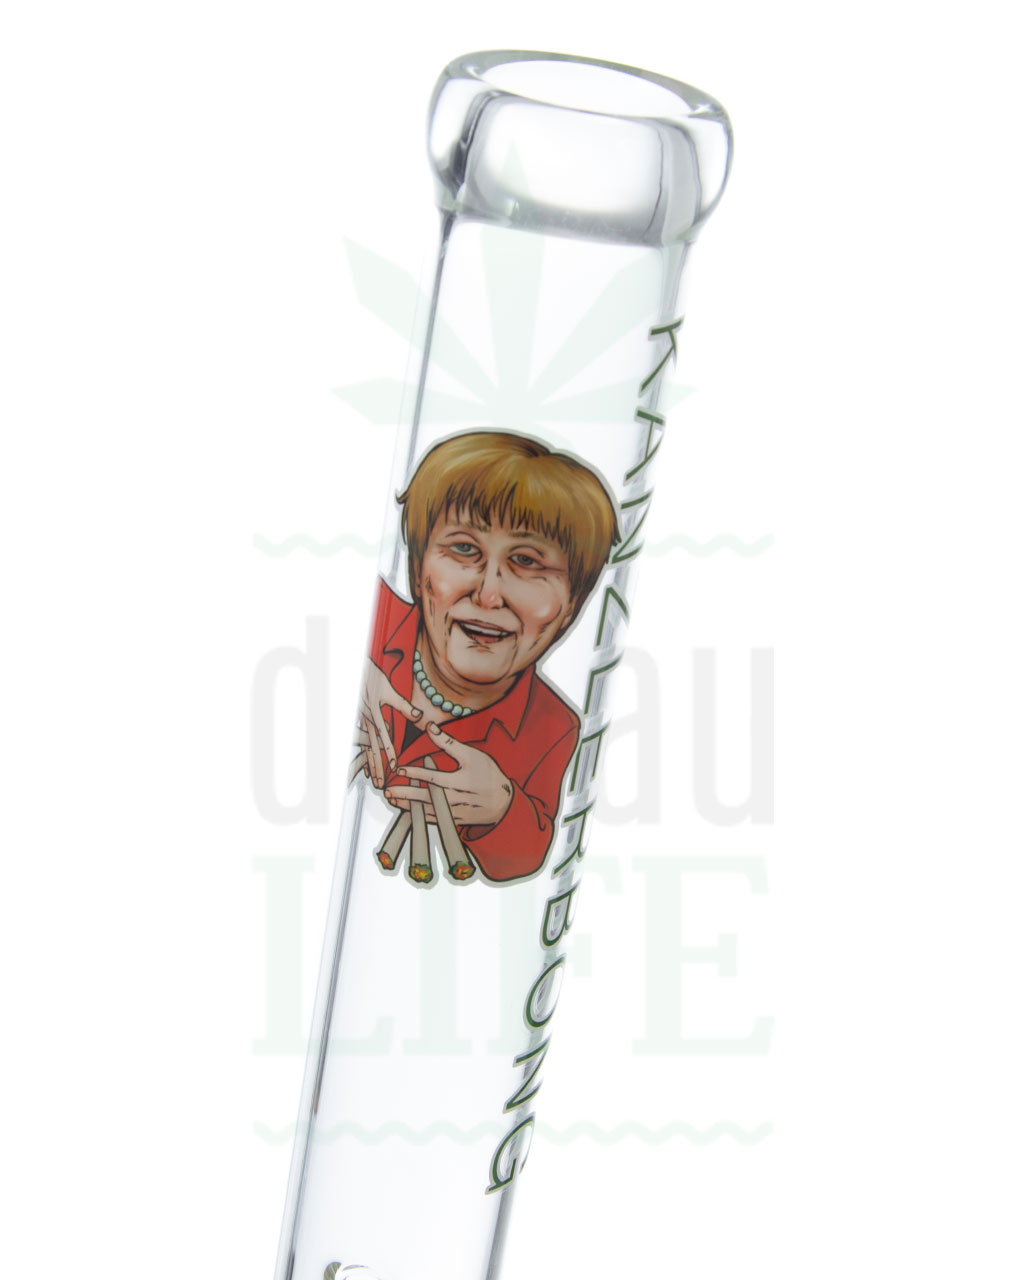 Black Leaf BLACK LEAF Kanzlerbong 'Merkel Edition' | 38 cm